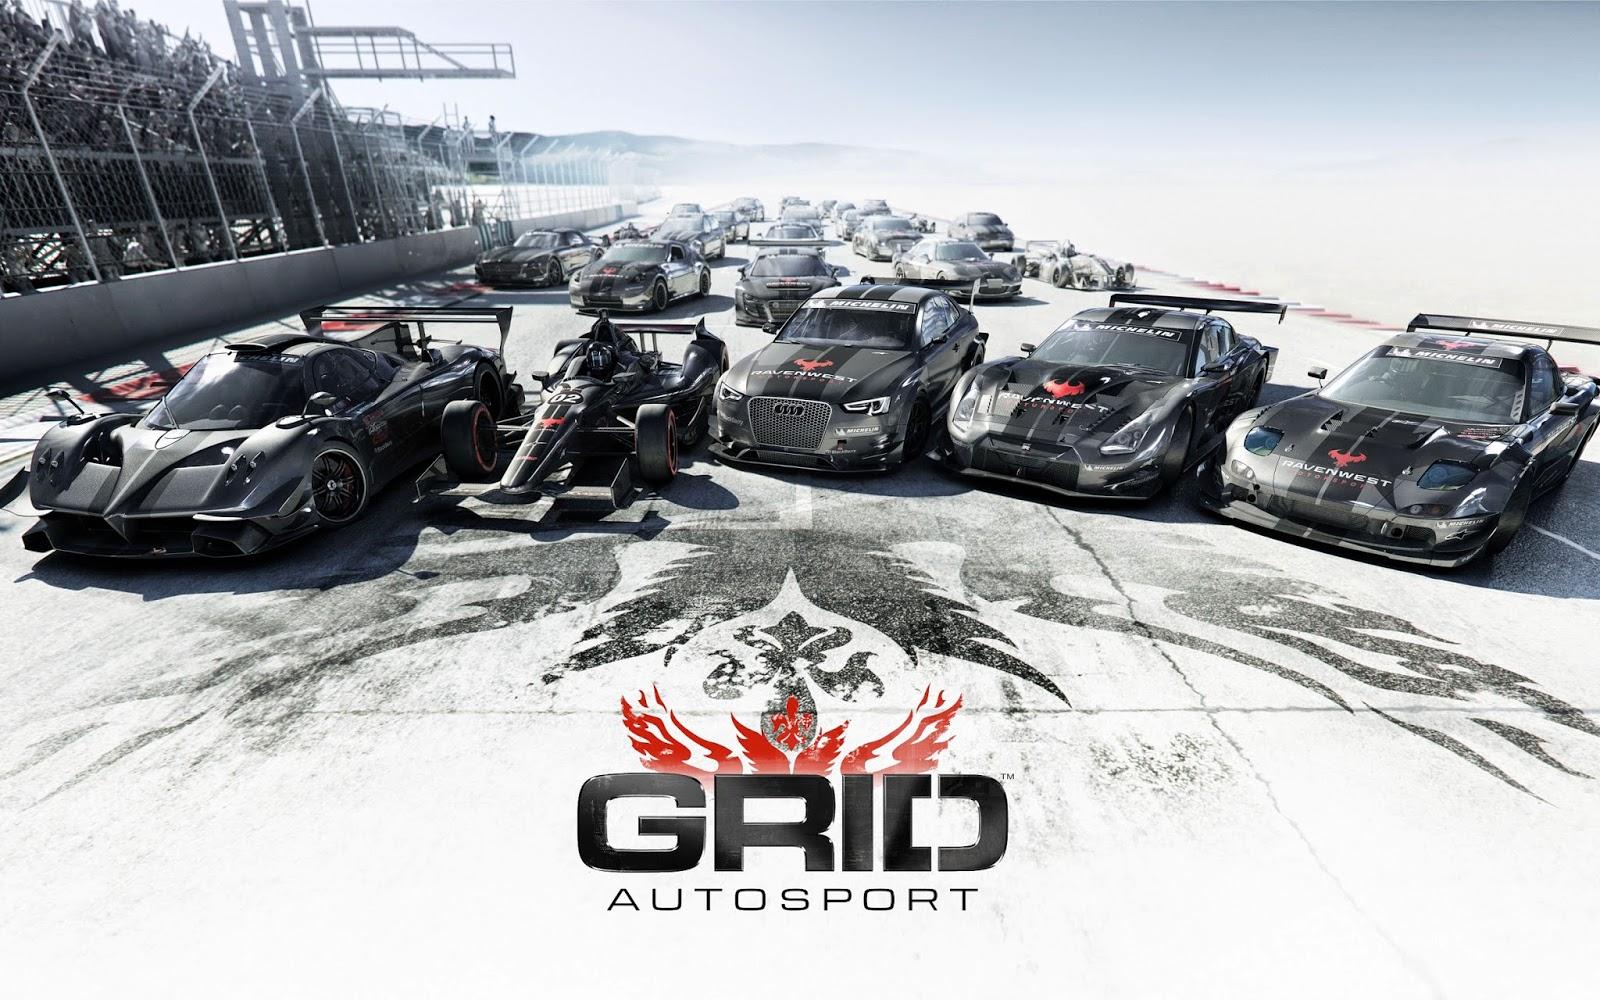 Spesifikasi PC Untuk Grid: Autosport (Codemasters)